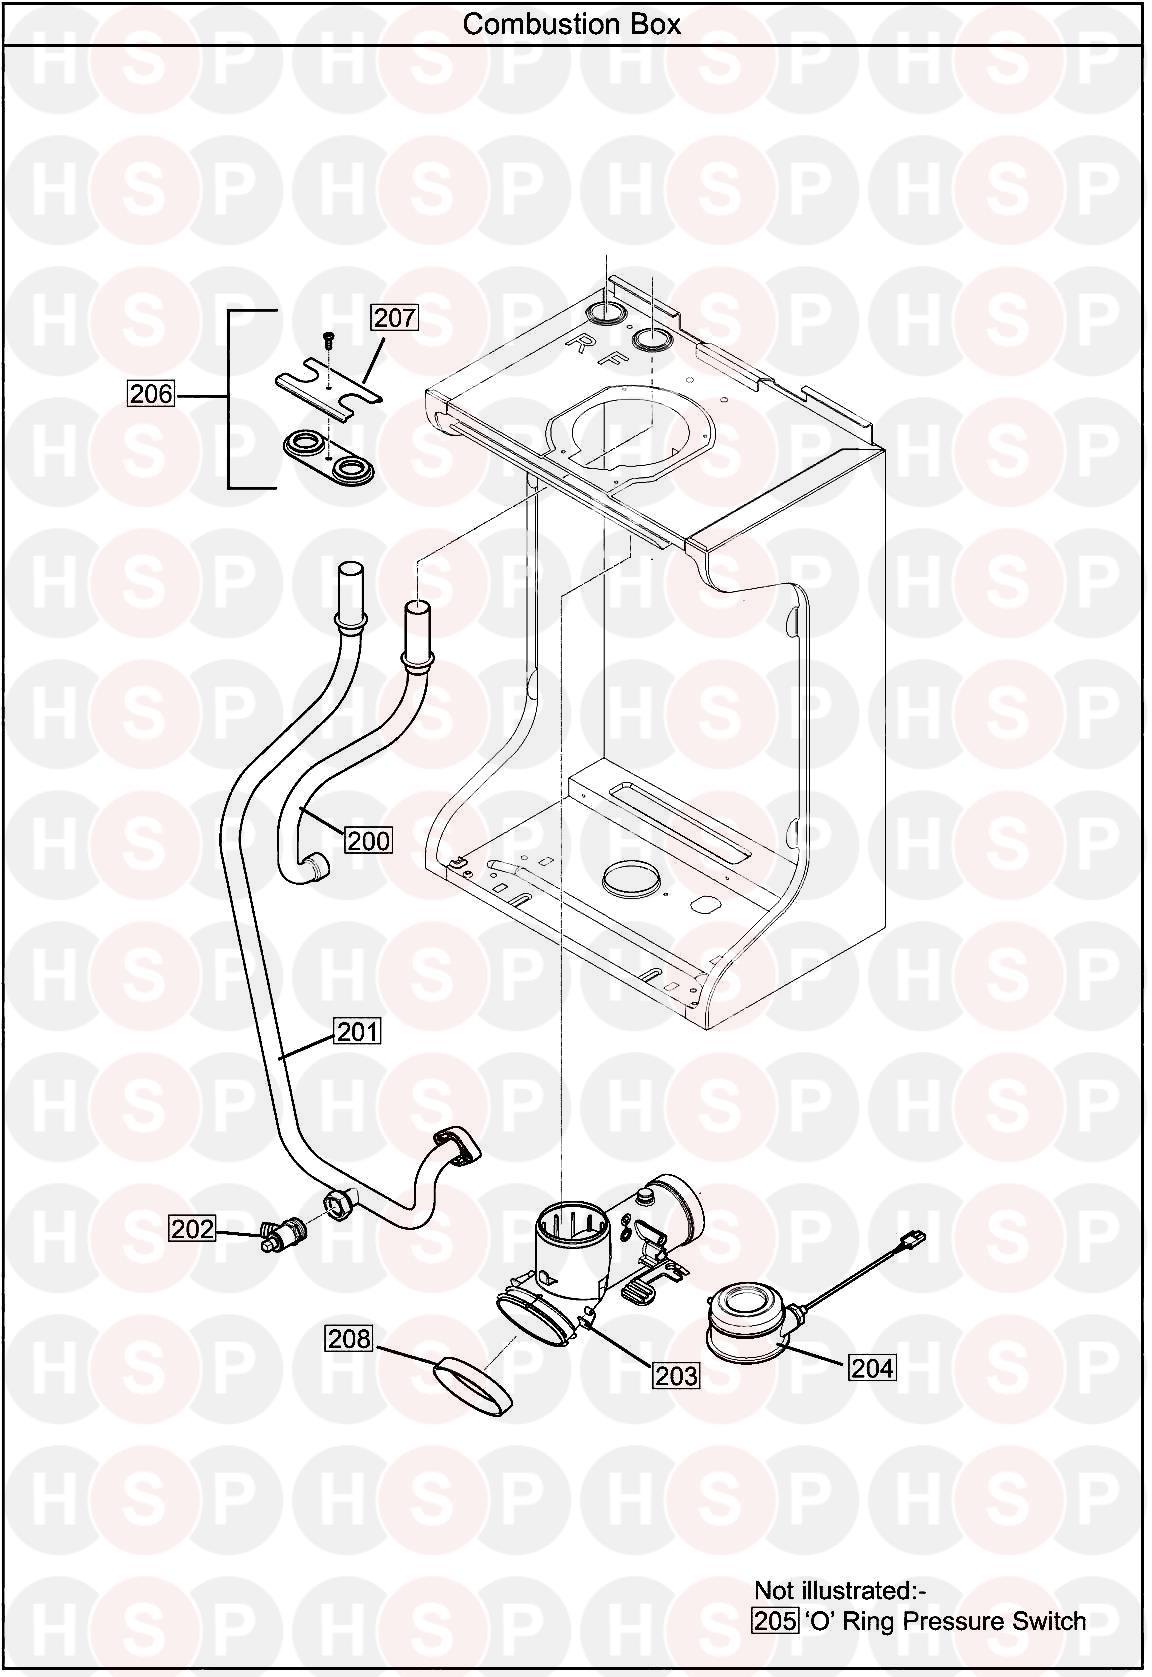 Baxi Ecoblue Heat 21  Combustion Box Diagram